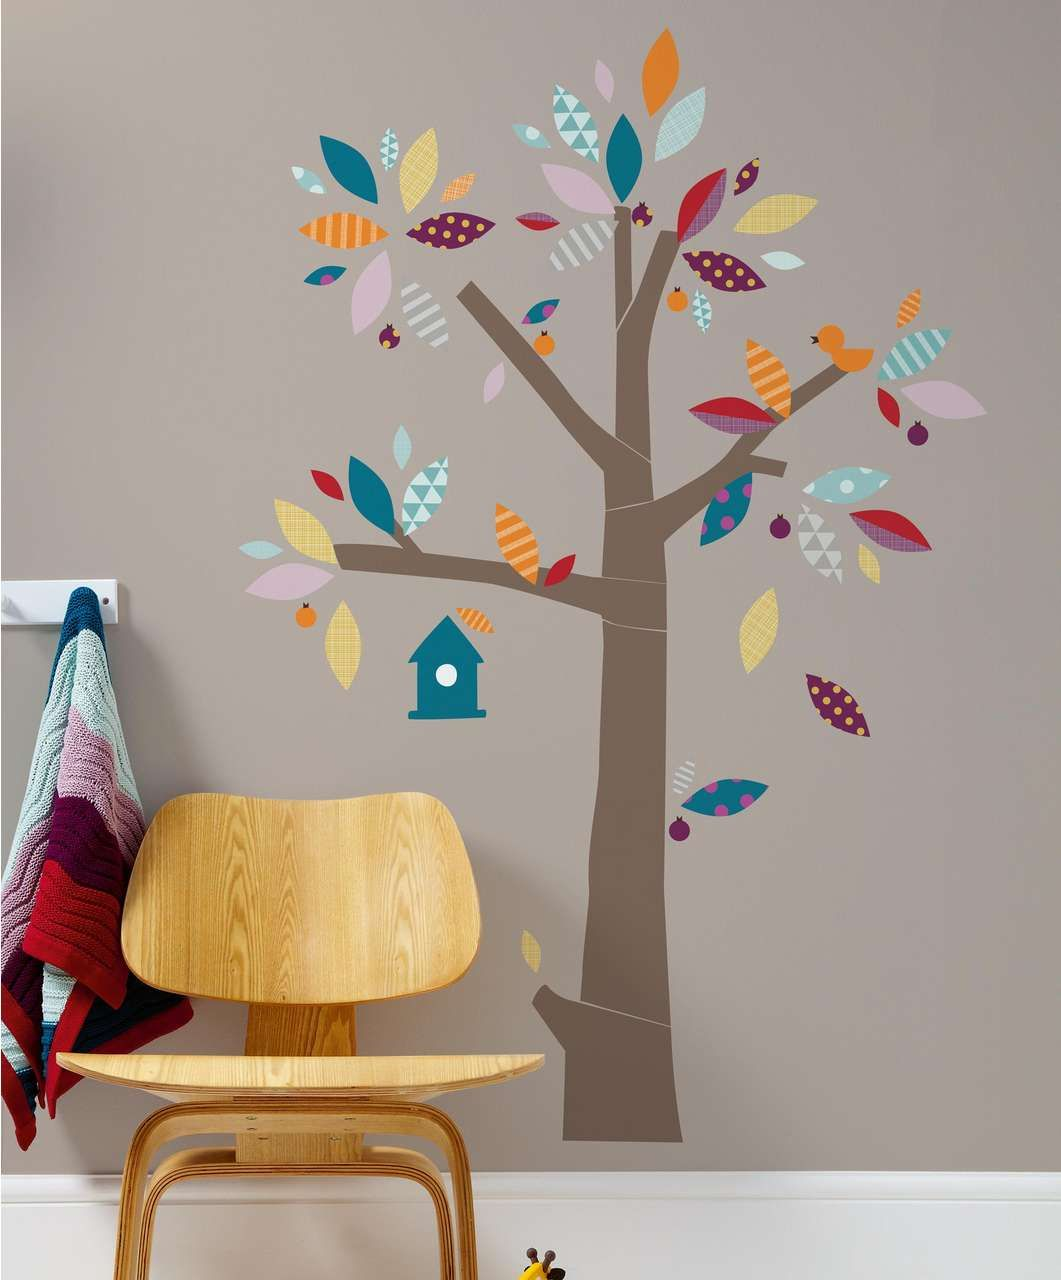 patternology tree wall stickers nursery accessories mamas patternology tree wall stickers nursery accessories mamas papas mamasandpapas dreamnursery